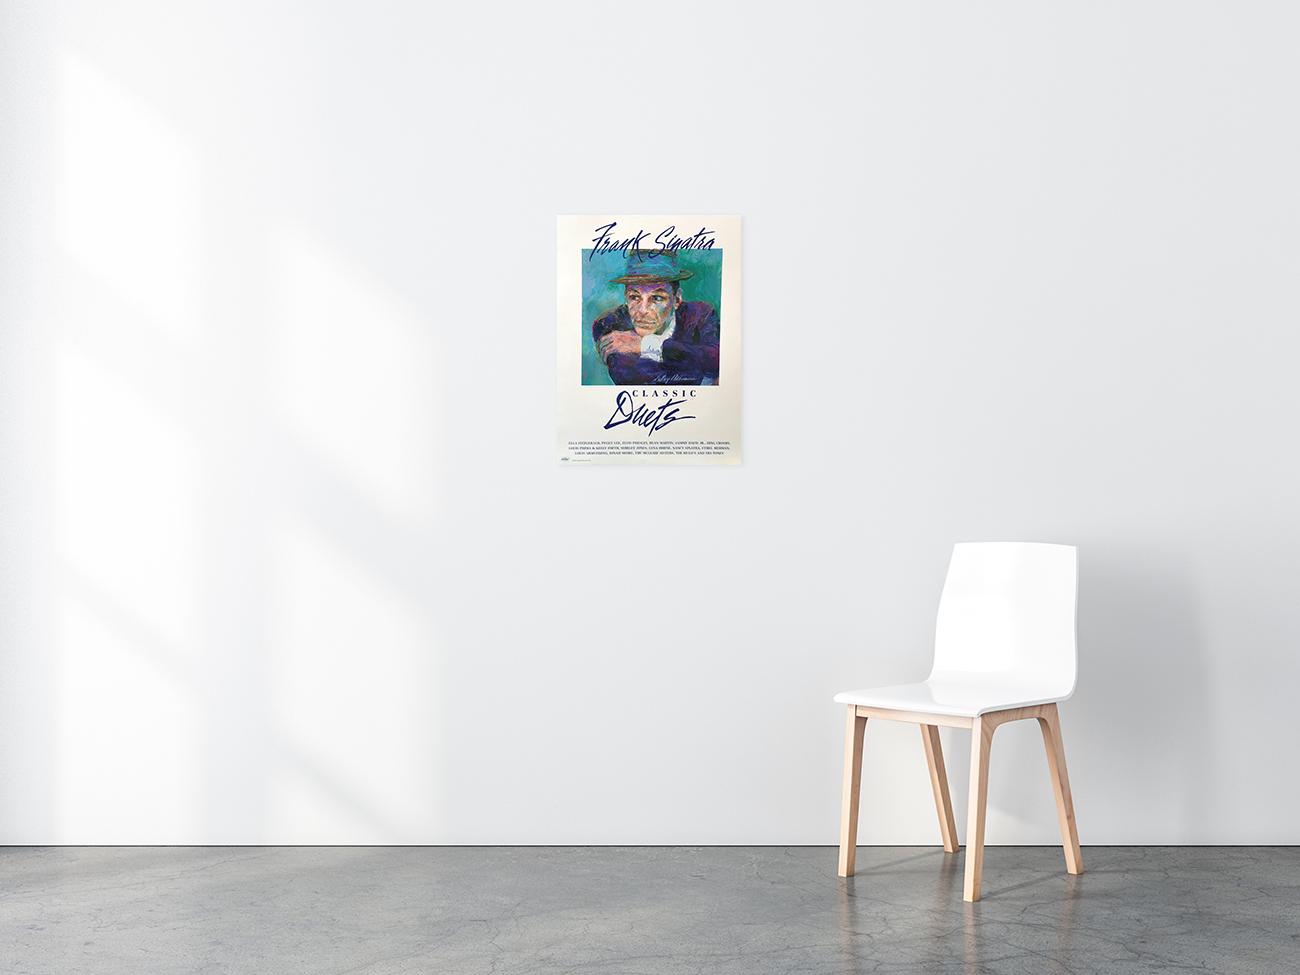 Frank Sinatra poster in situ